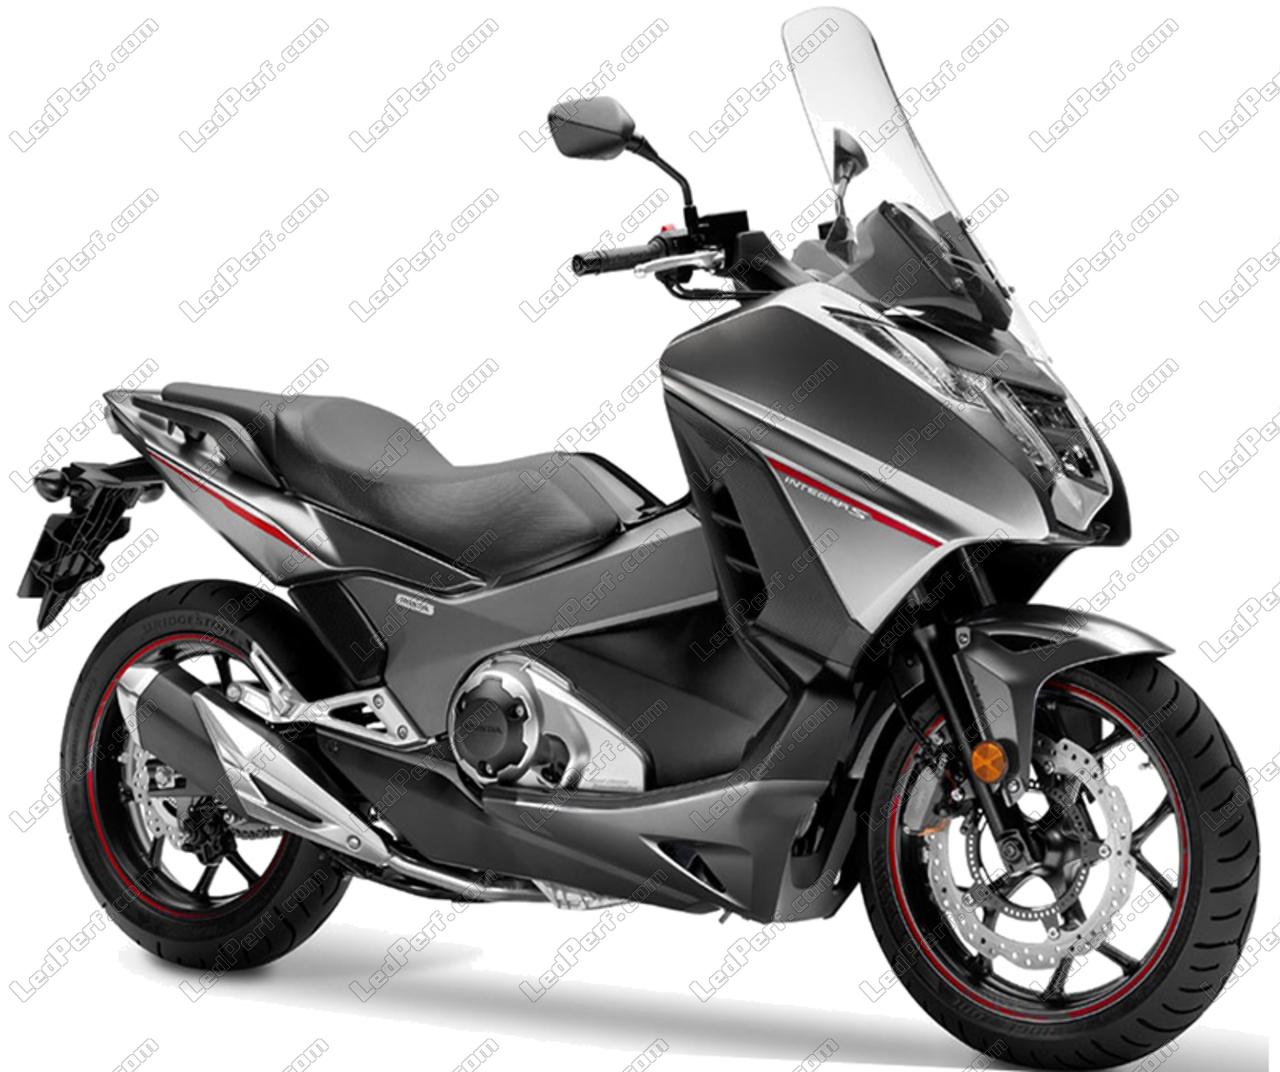 Pack Leds Veilleuses Pour Honda Integra 700 750 (feux De